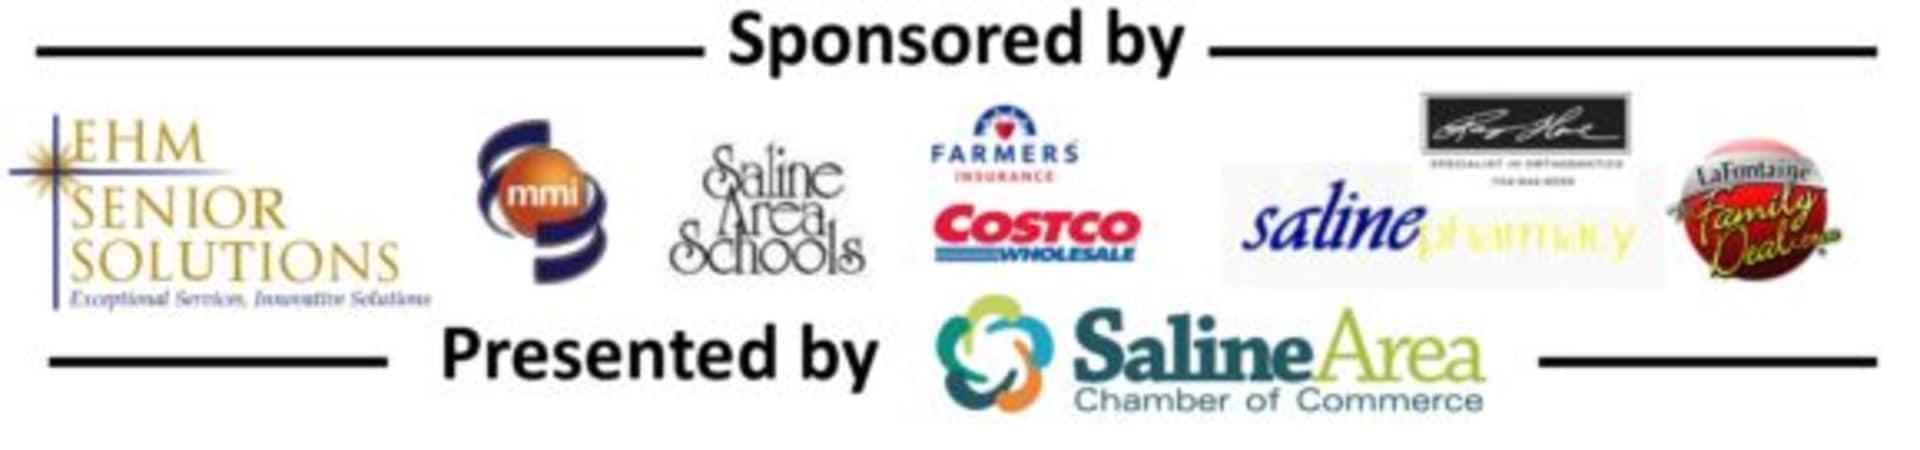 Salutes18-sponsors.jpg